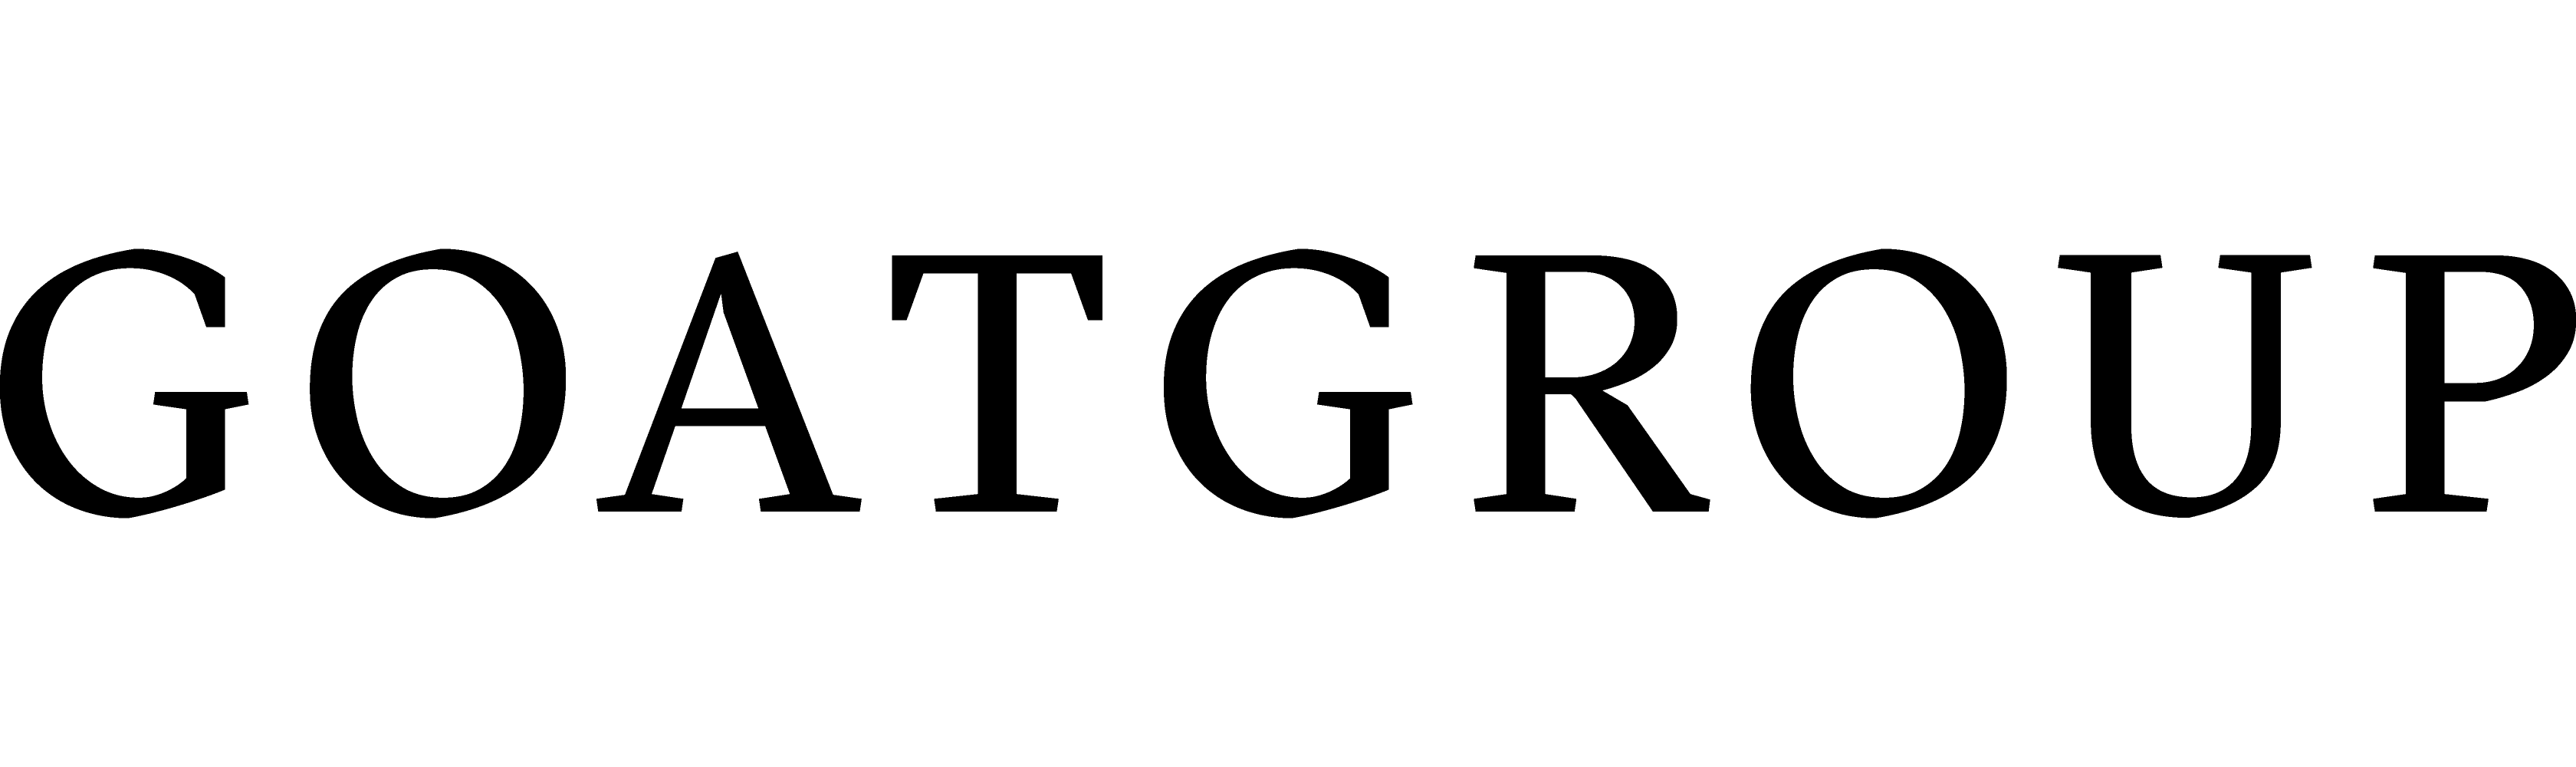 GOAT Group logo